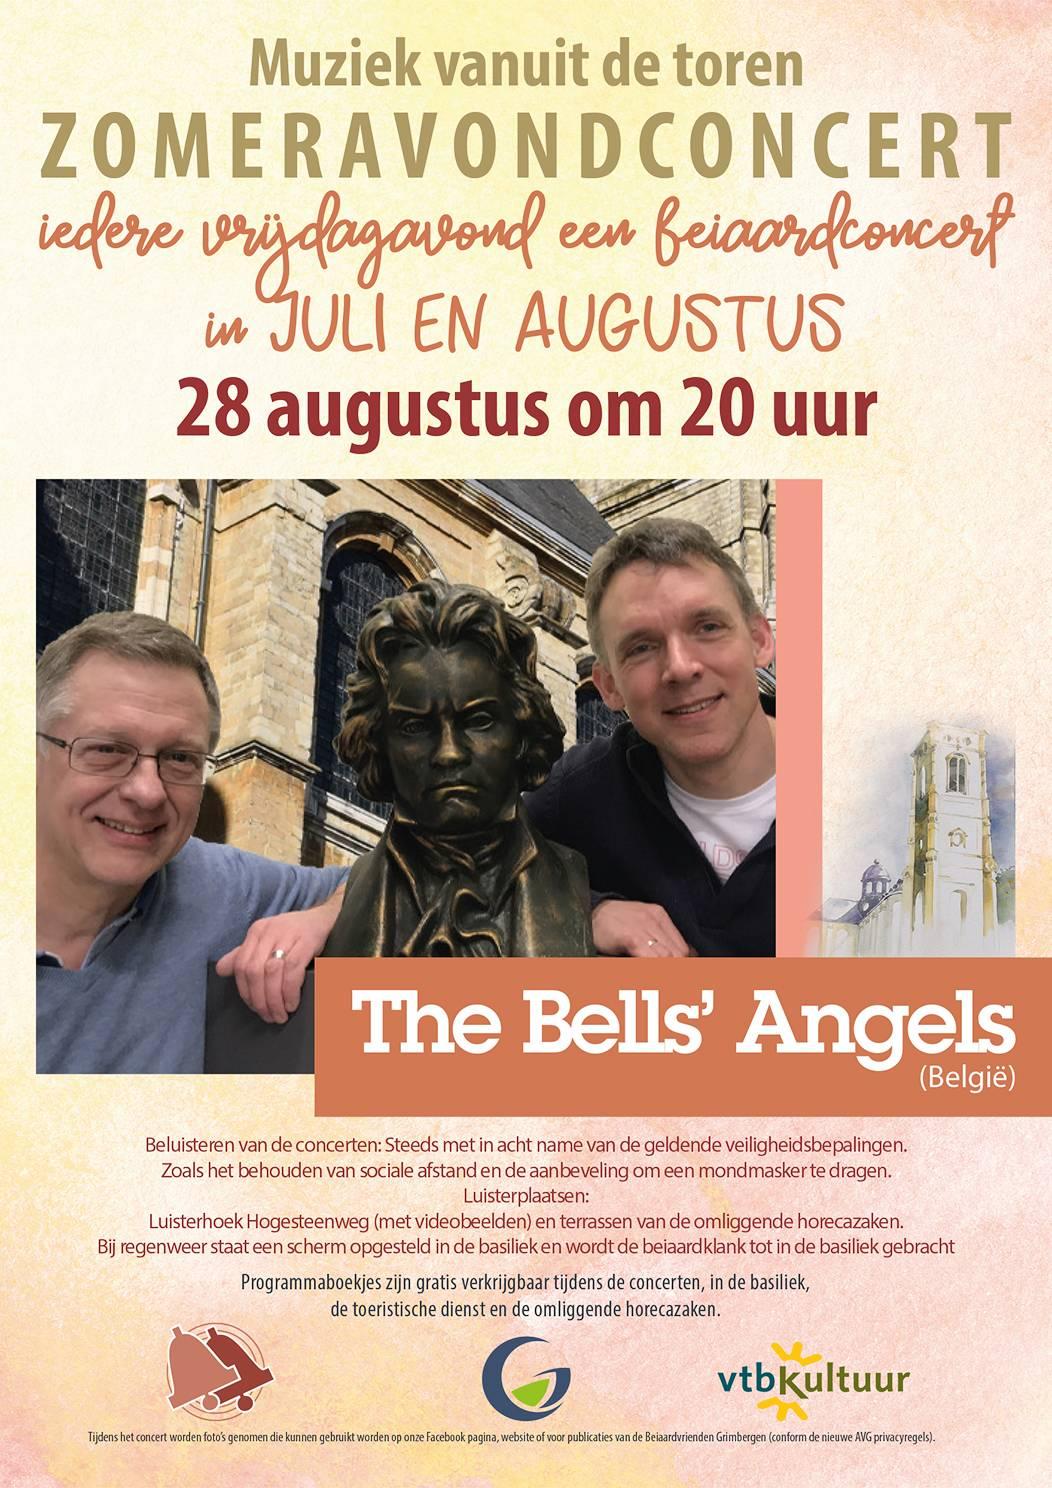 Zomeravondconcerten - The Bells' Angels (B)